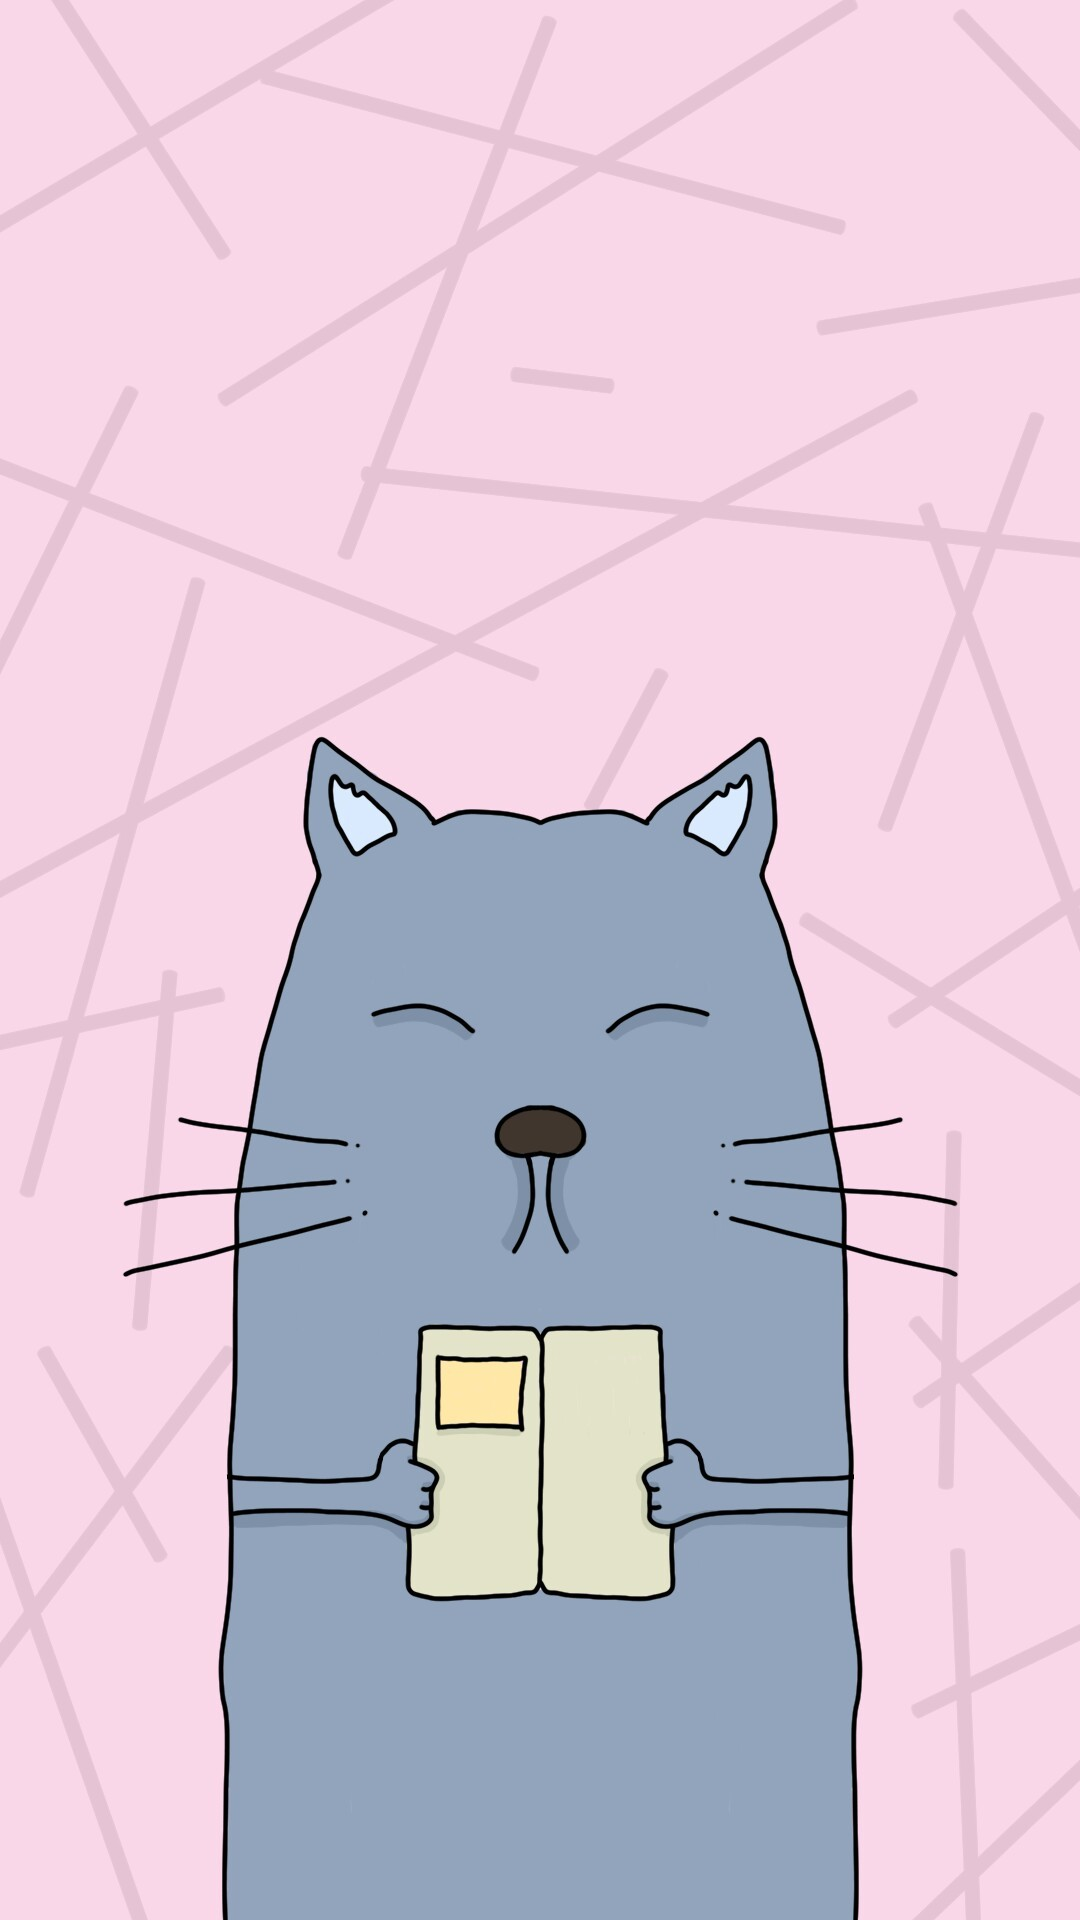 Smart cat #wallpaper #phone #iphone #vector #cartoon #drawing #grunge